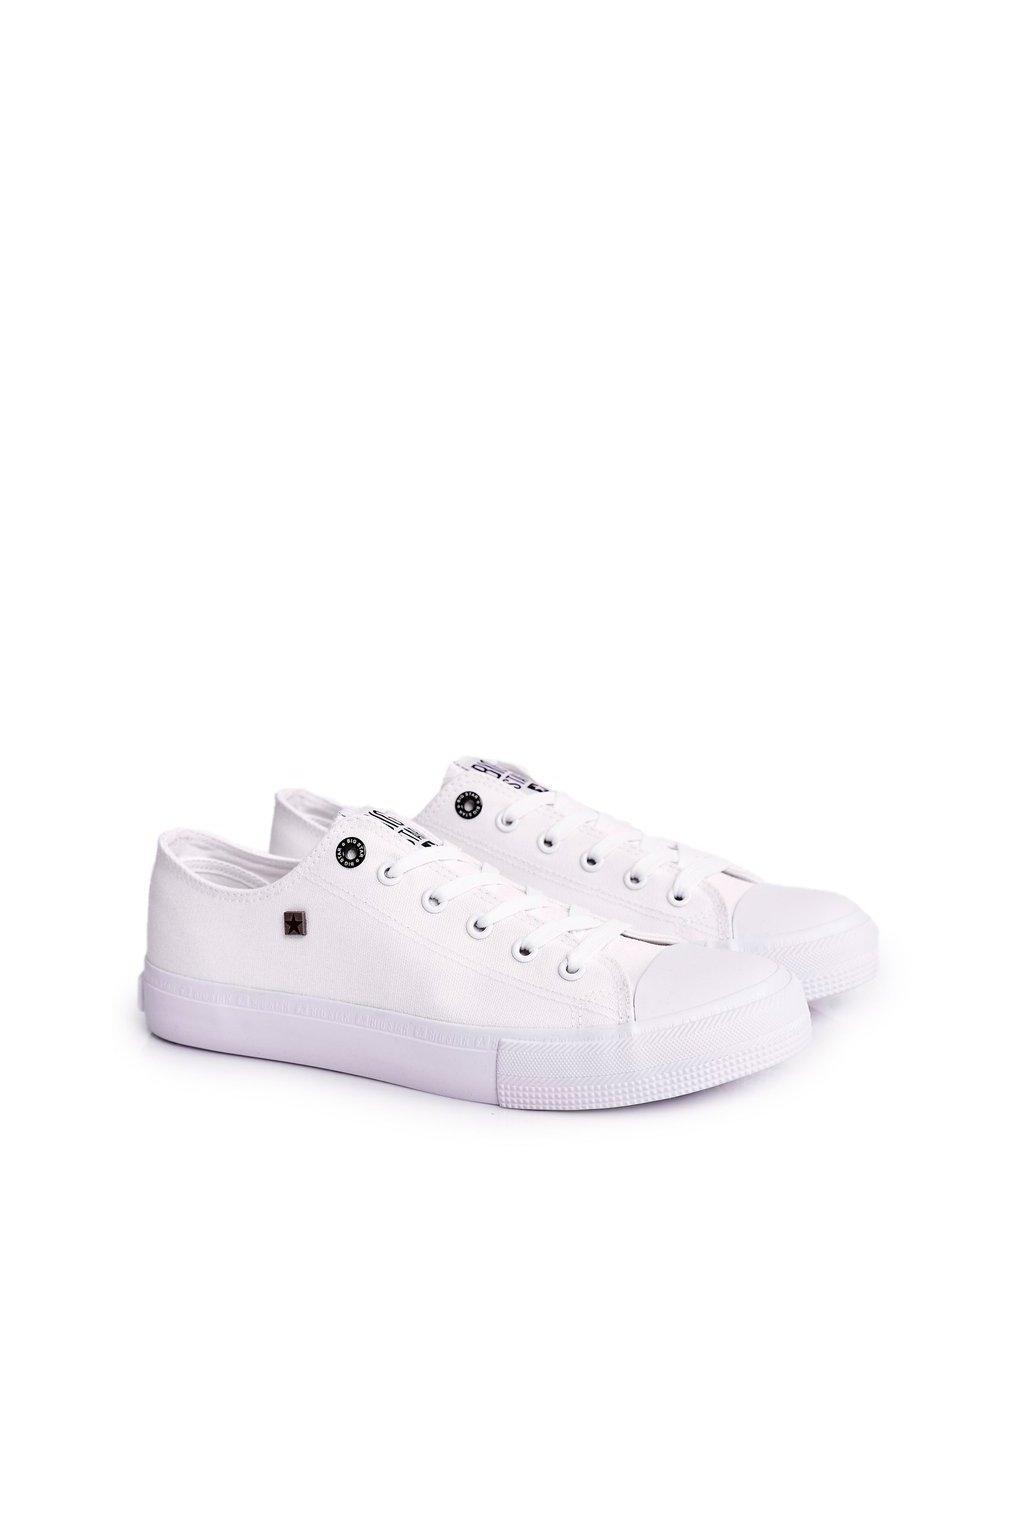 Biela obuv kód topánok AA174010 WHITE